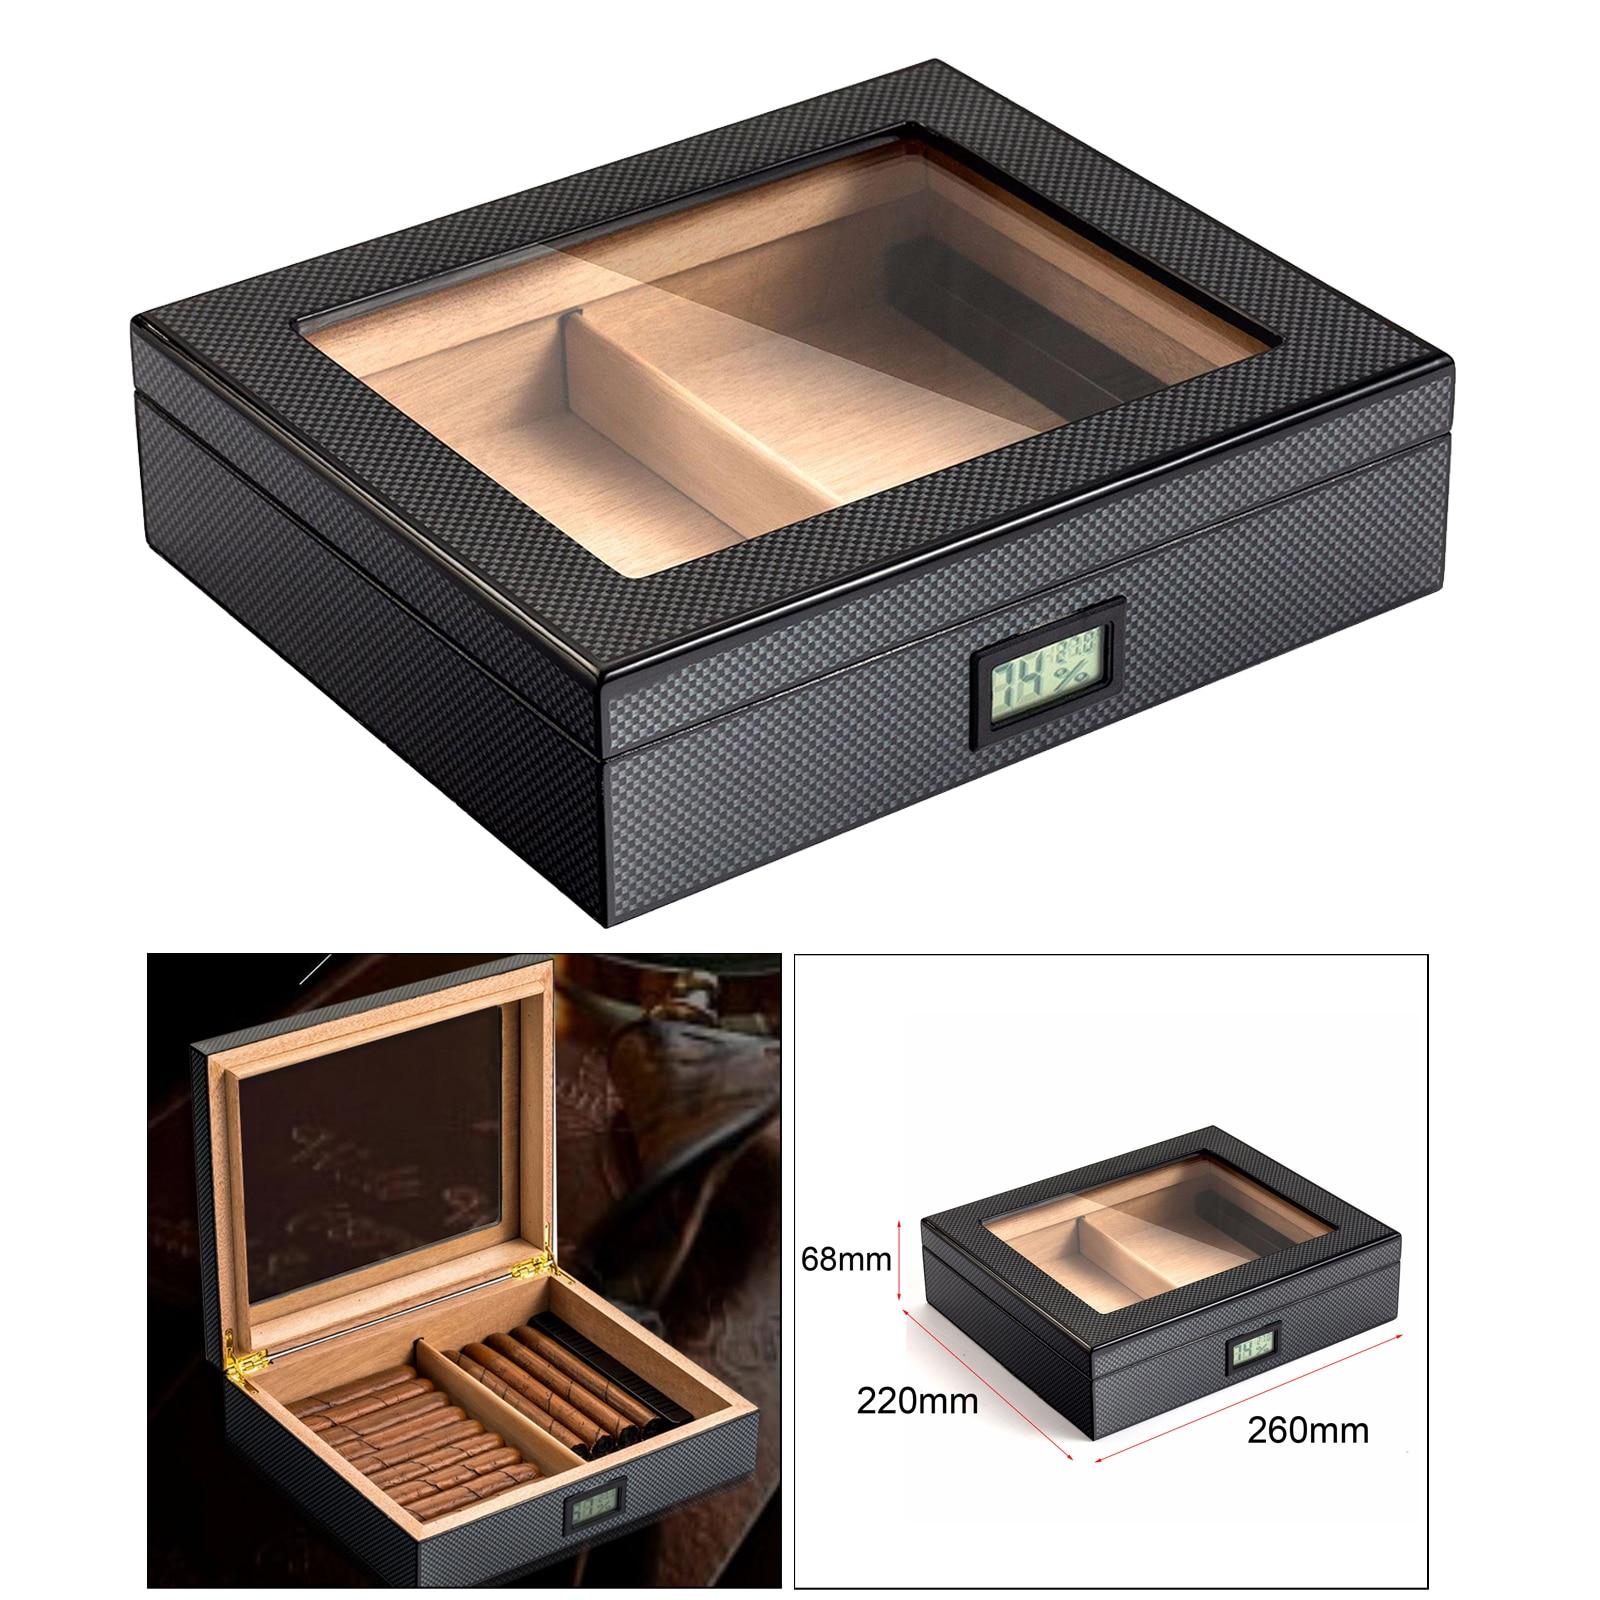 Portable Travel Cedar Cigar Case, Cigar Humidor with Hygrometer and Humidifier for Club Desktop Cigar Case Accessories